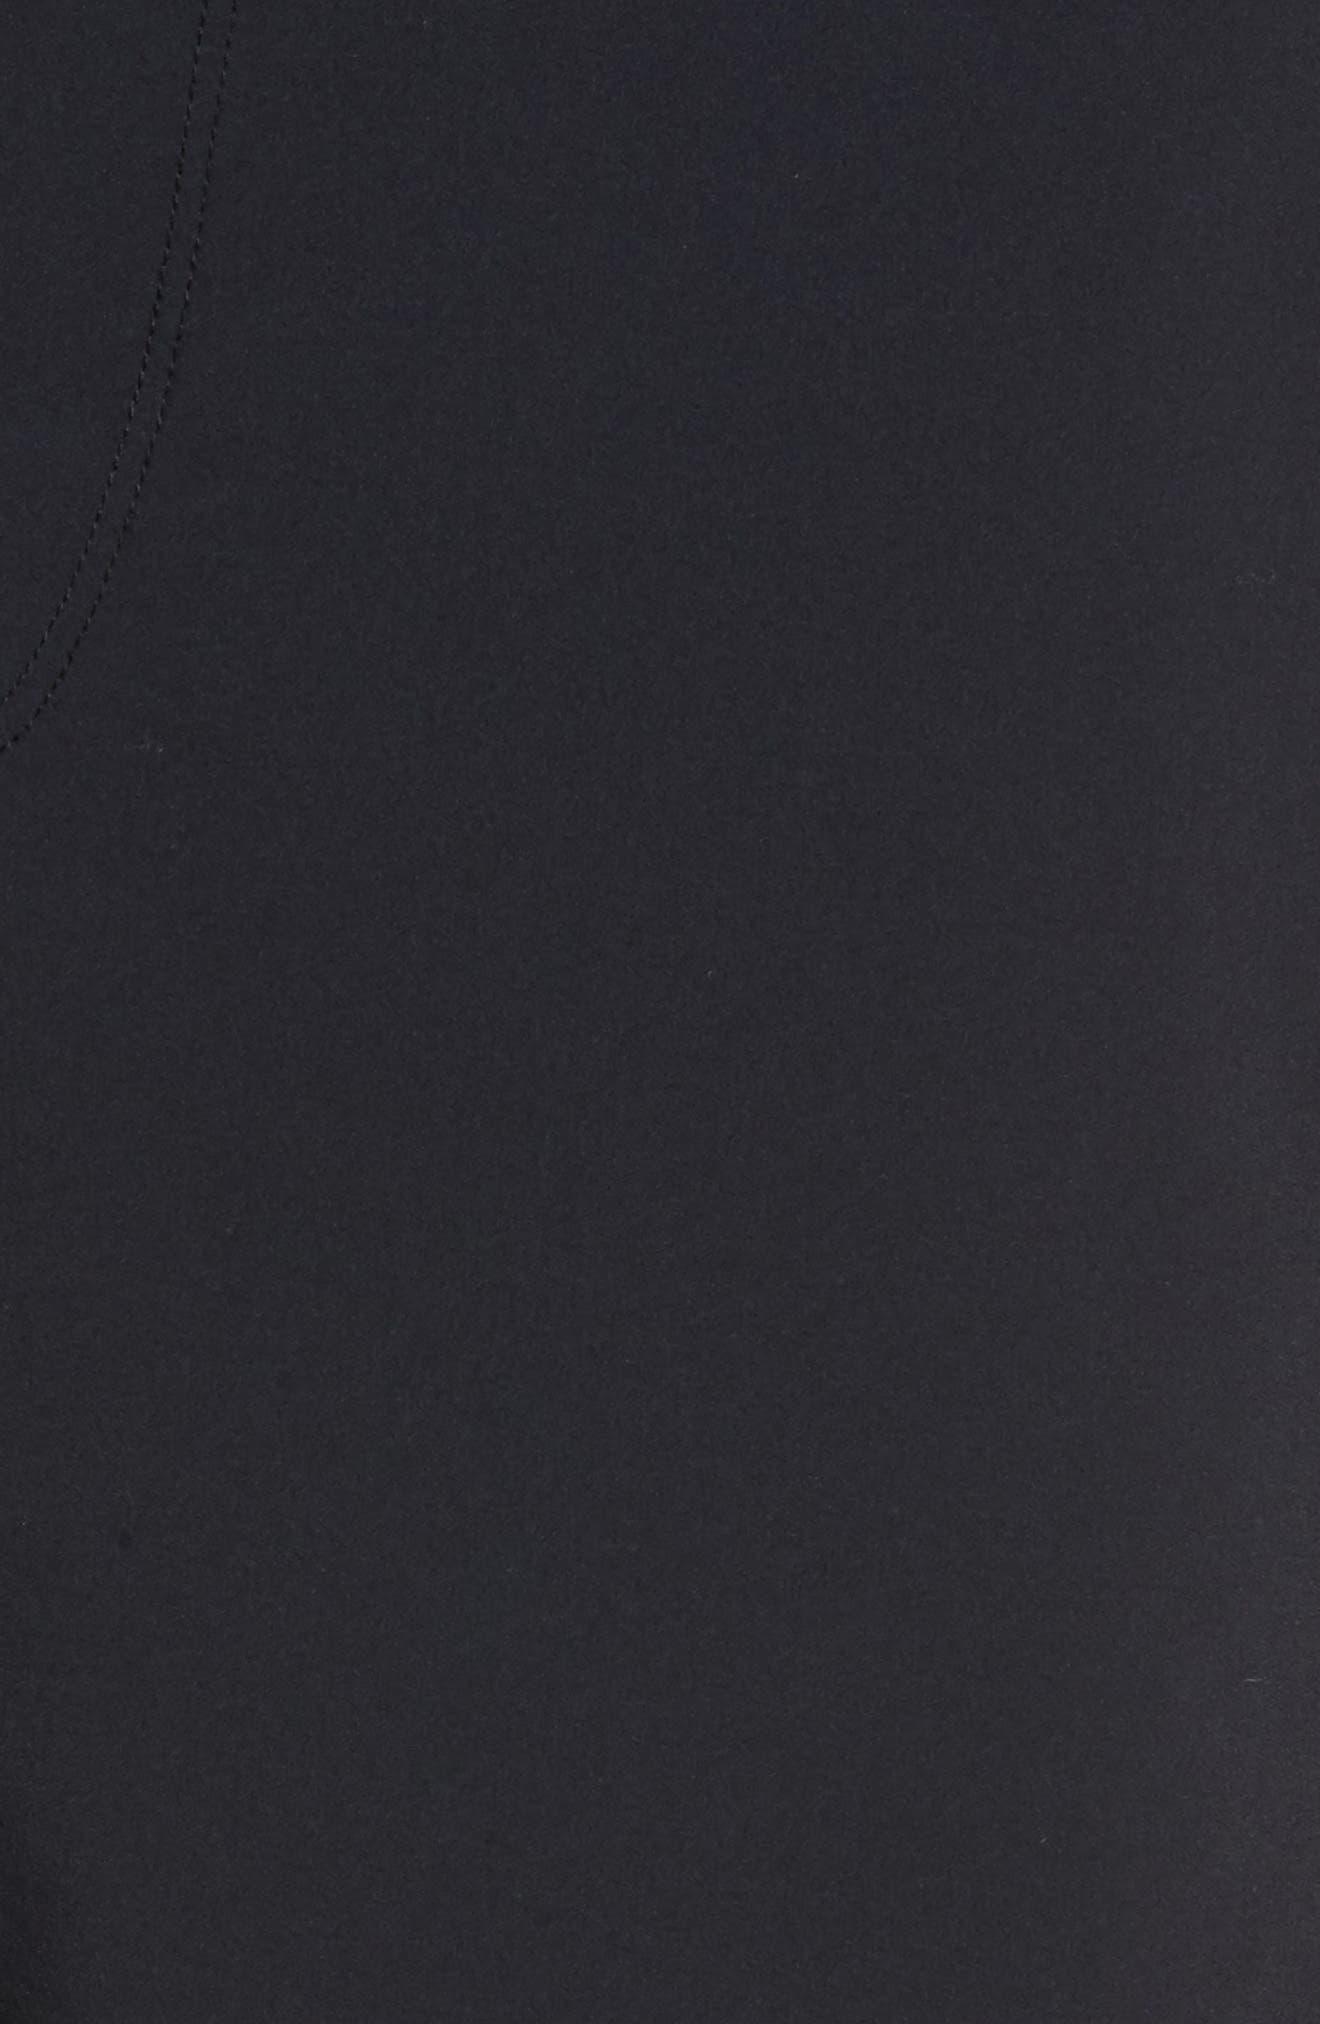 Interval 2-in-1 Shorts,                             Alternate thumbnail 5, color,                             Black